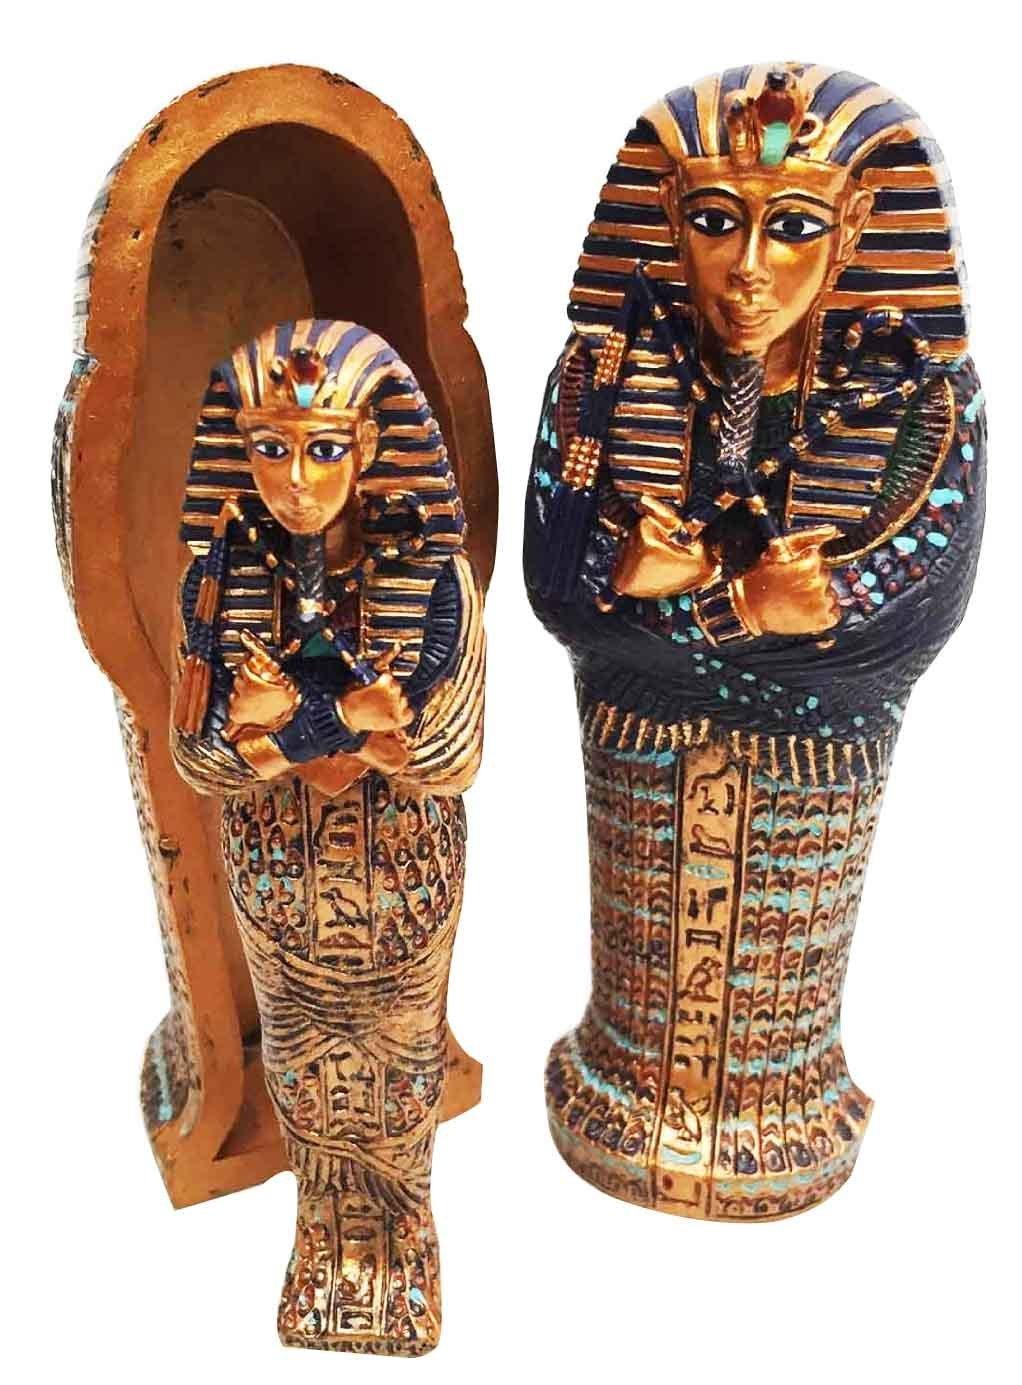 Uncategorized Pictures Of Sarcophagus amazon com mini egyptian king tut pharaoh sarcophagus with mummy sculpture figurine box beauty